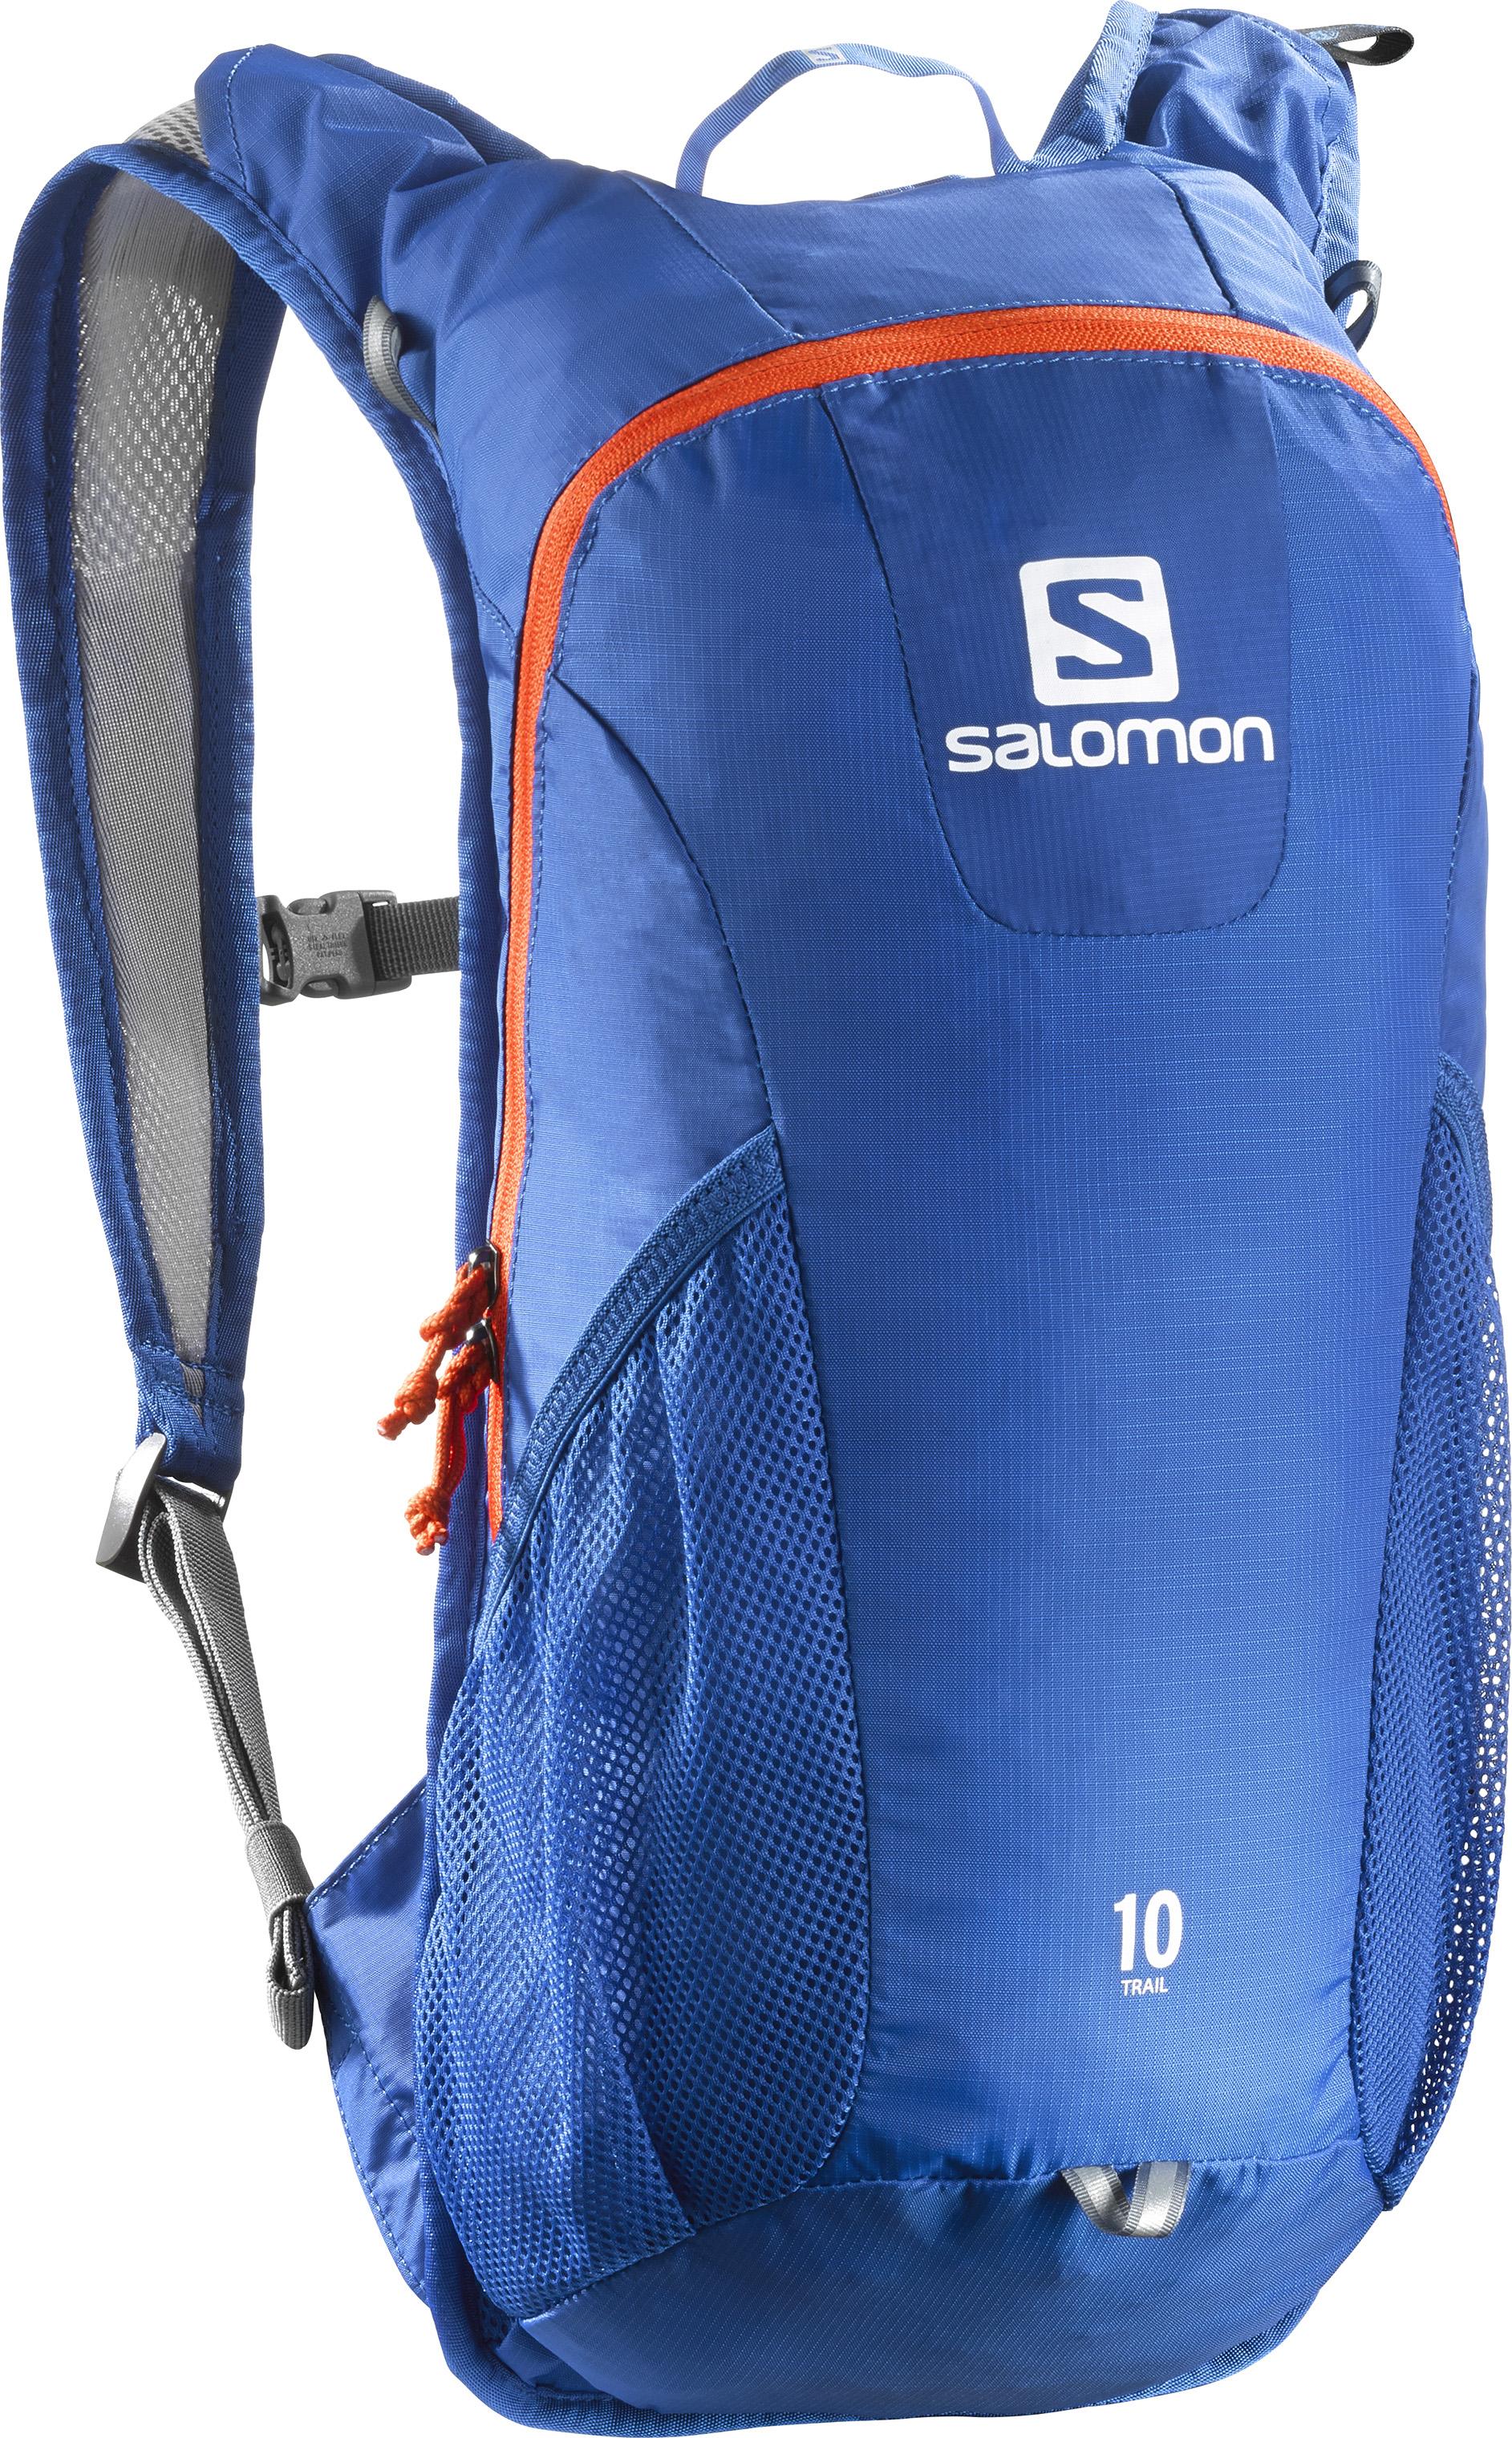 Salomon Trail 10 Blue Yonder/Vivid Orange 382362 modrá